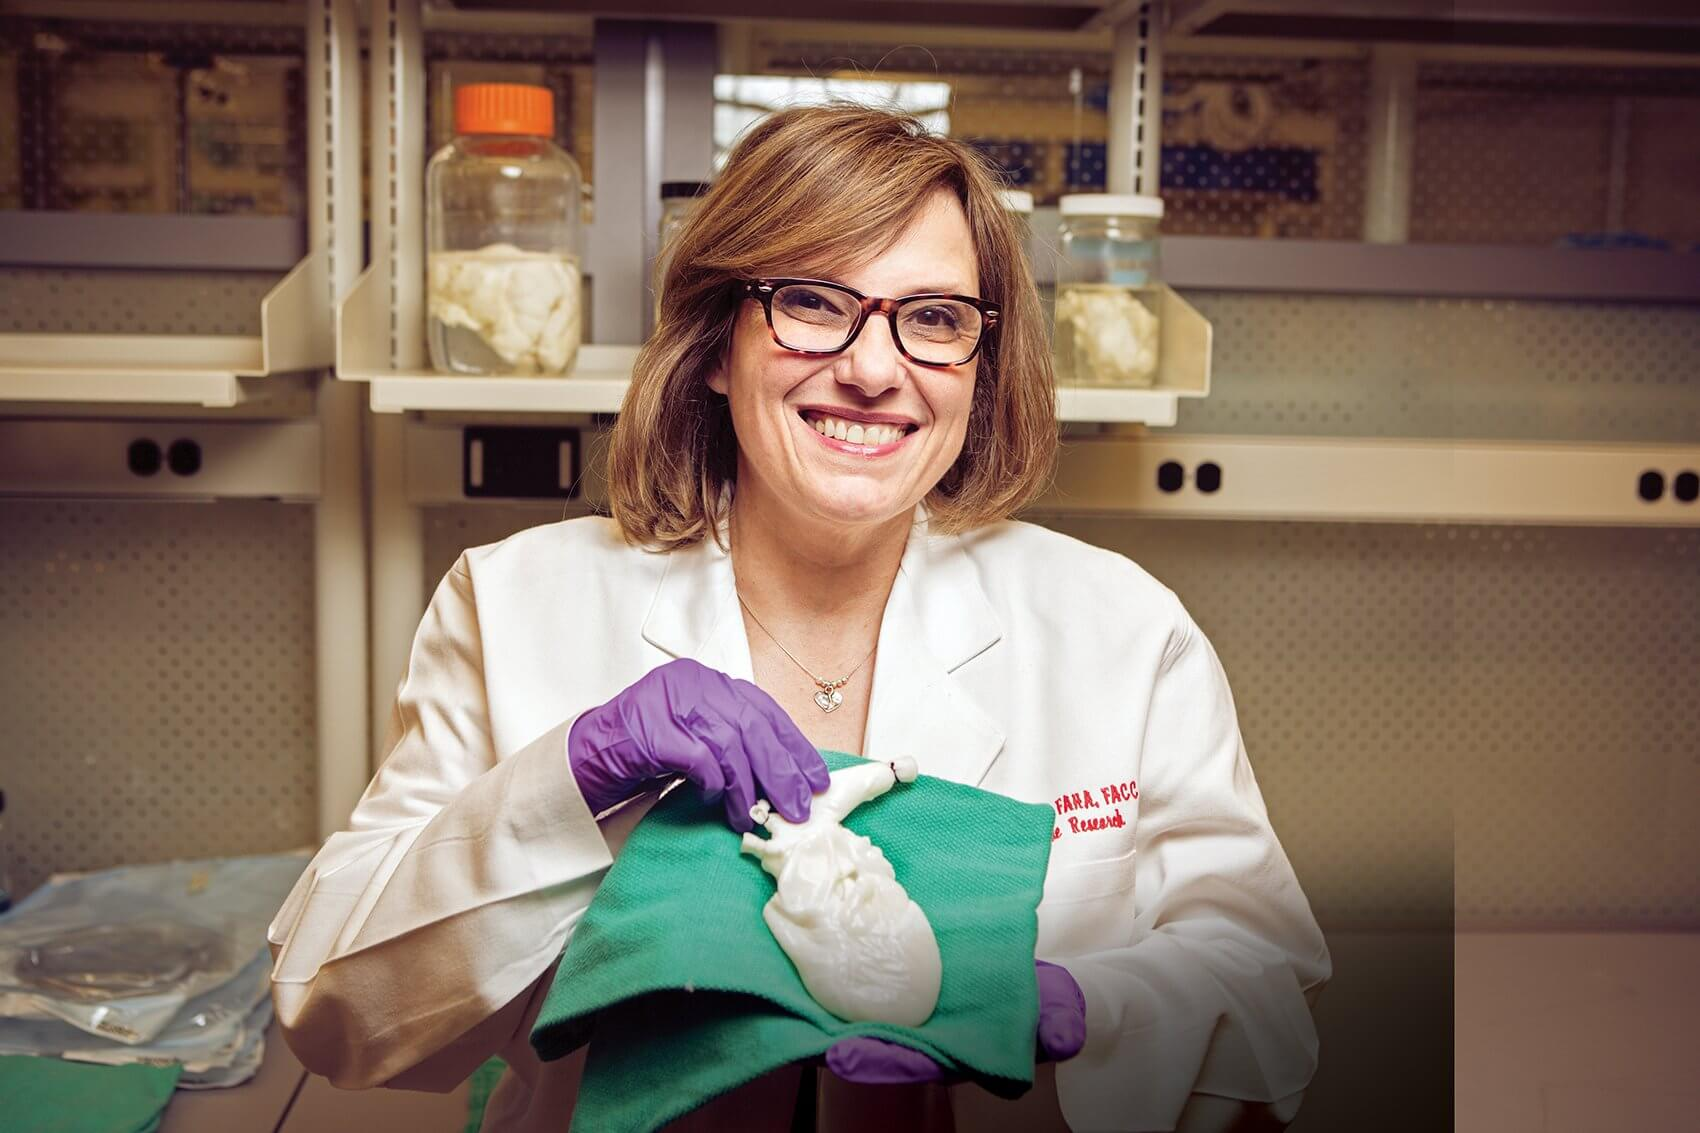 Doris A. Taylor, Ph.D., director of Regenerative Medicine Research at Texas Heart Institute